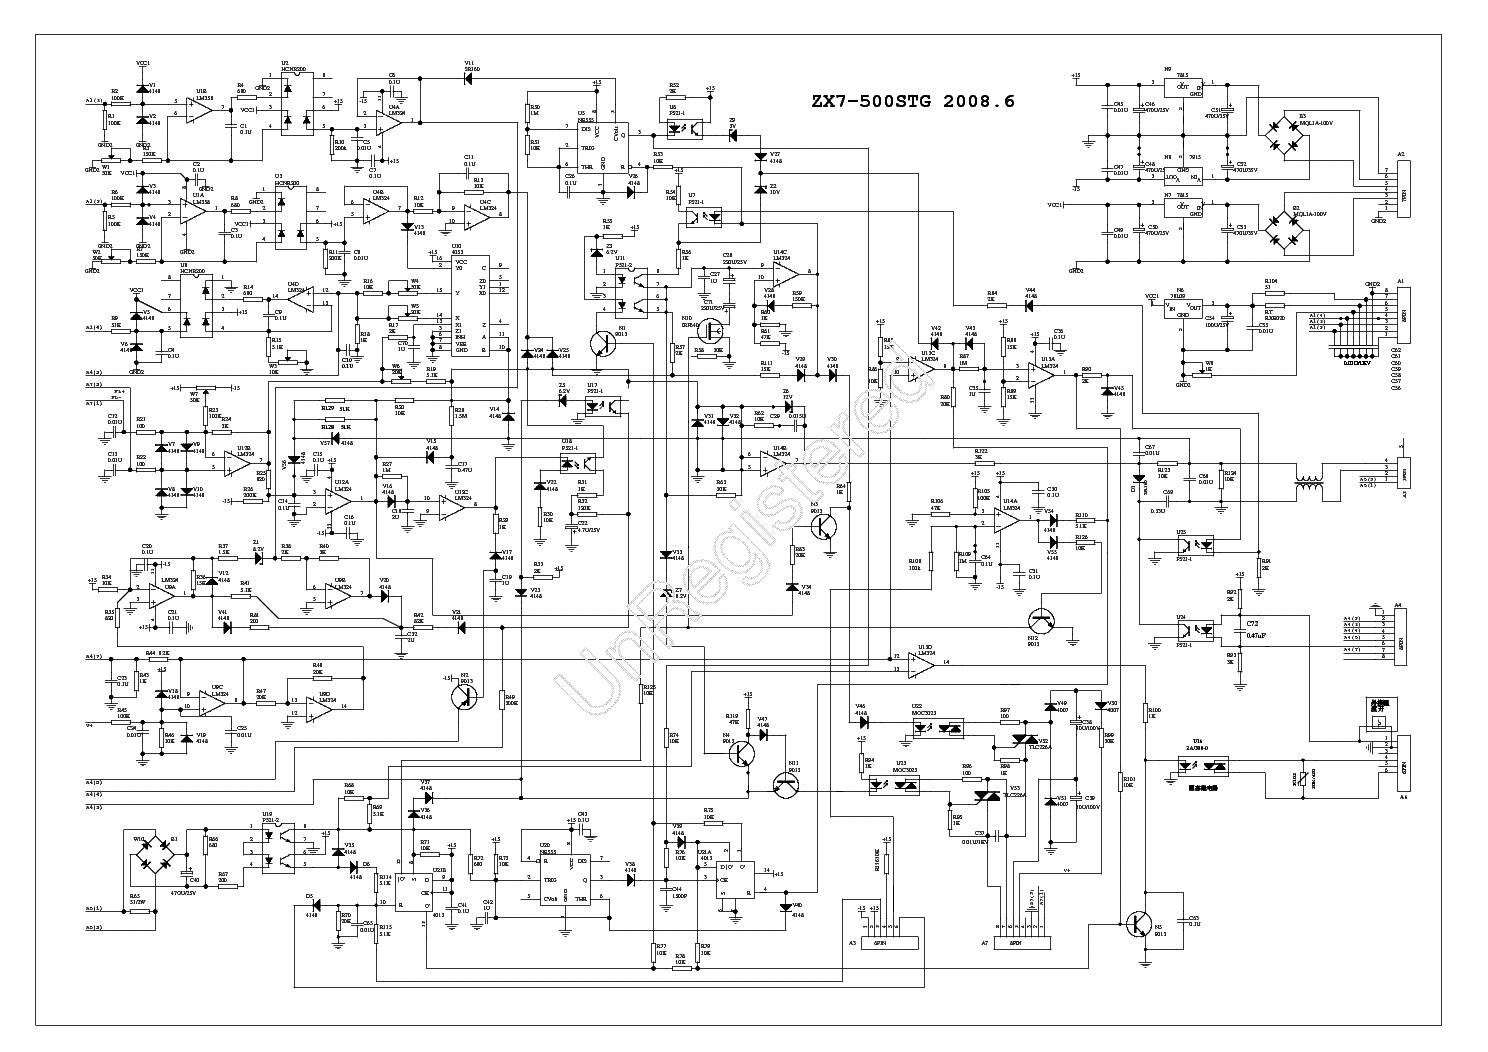 Ow 3997 Zx7 Wiring Diagram Free Download Wiring Diagram